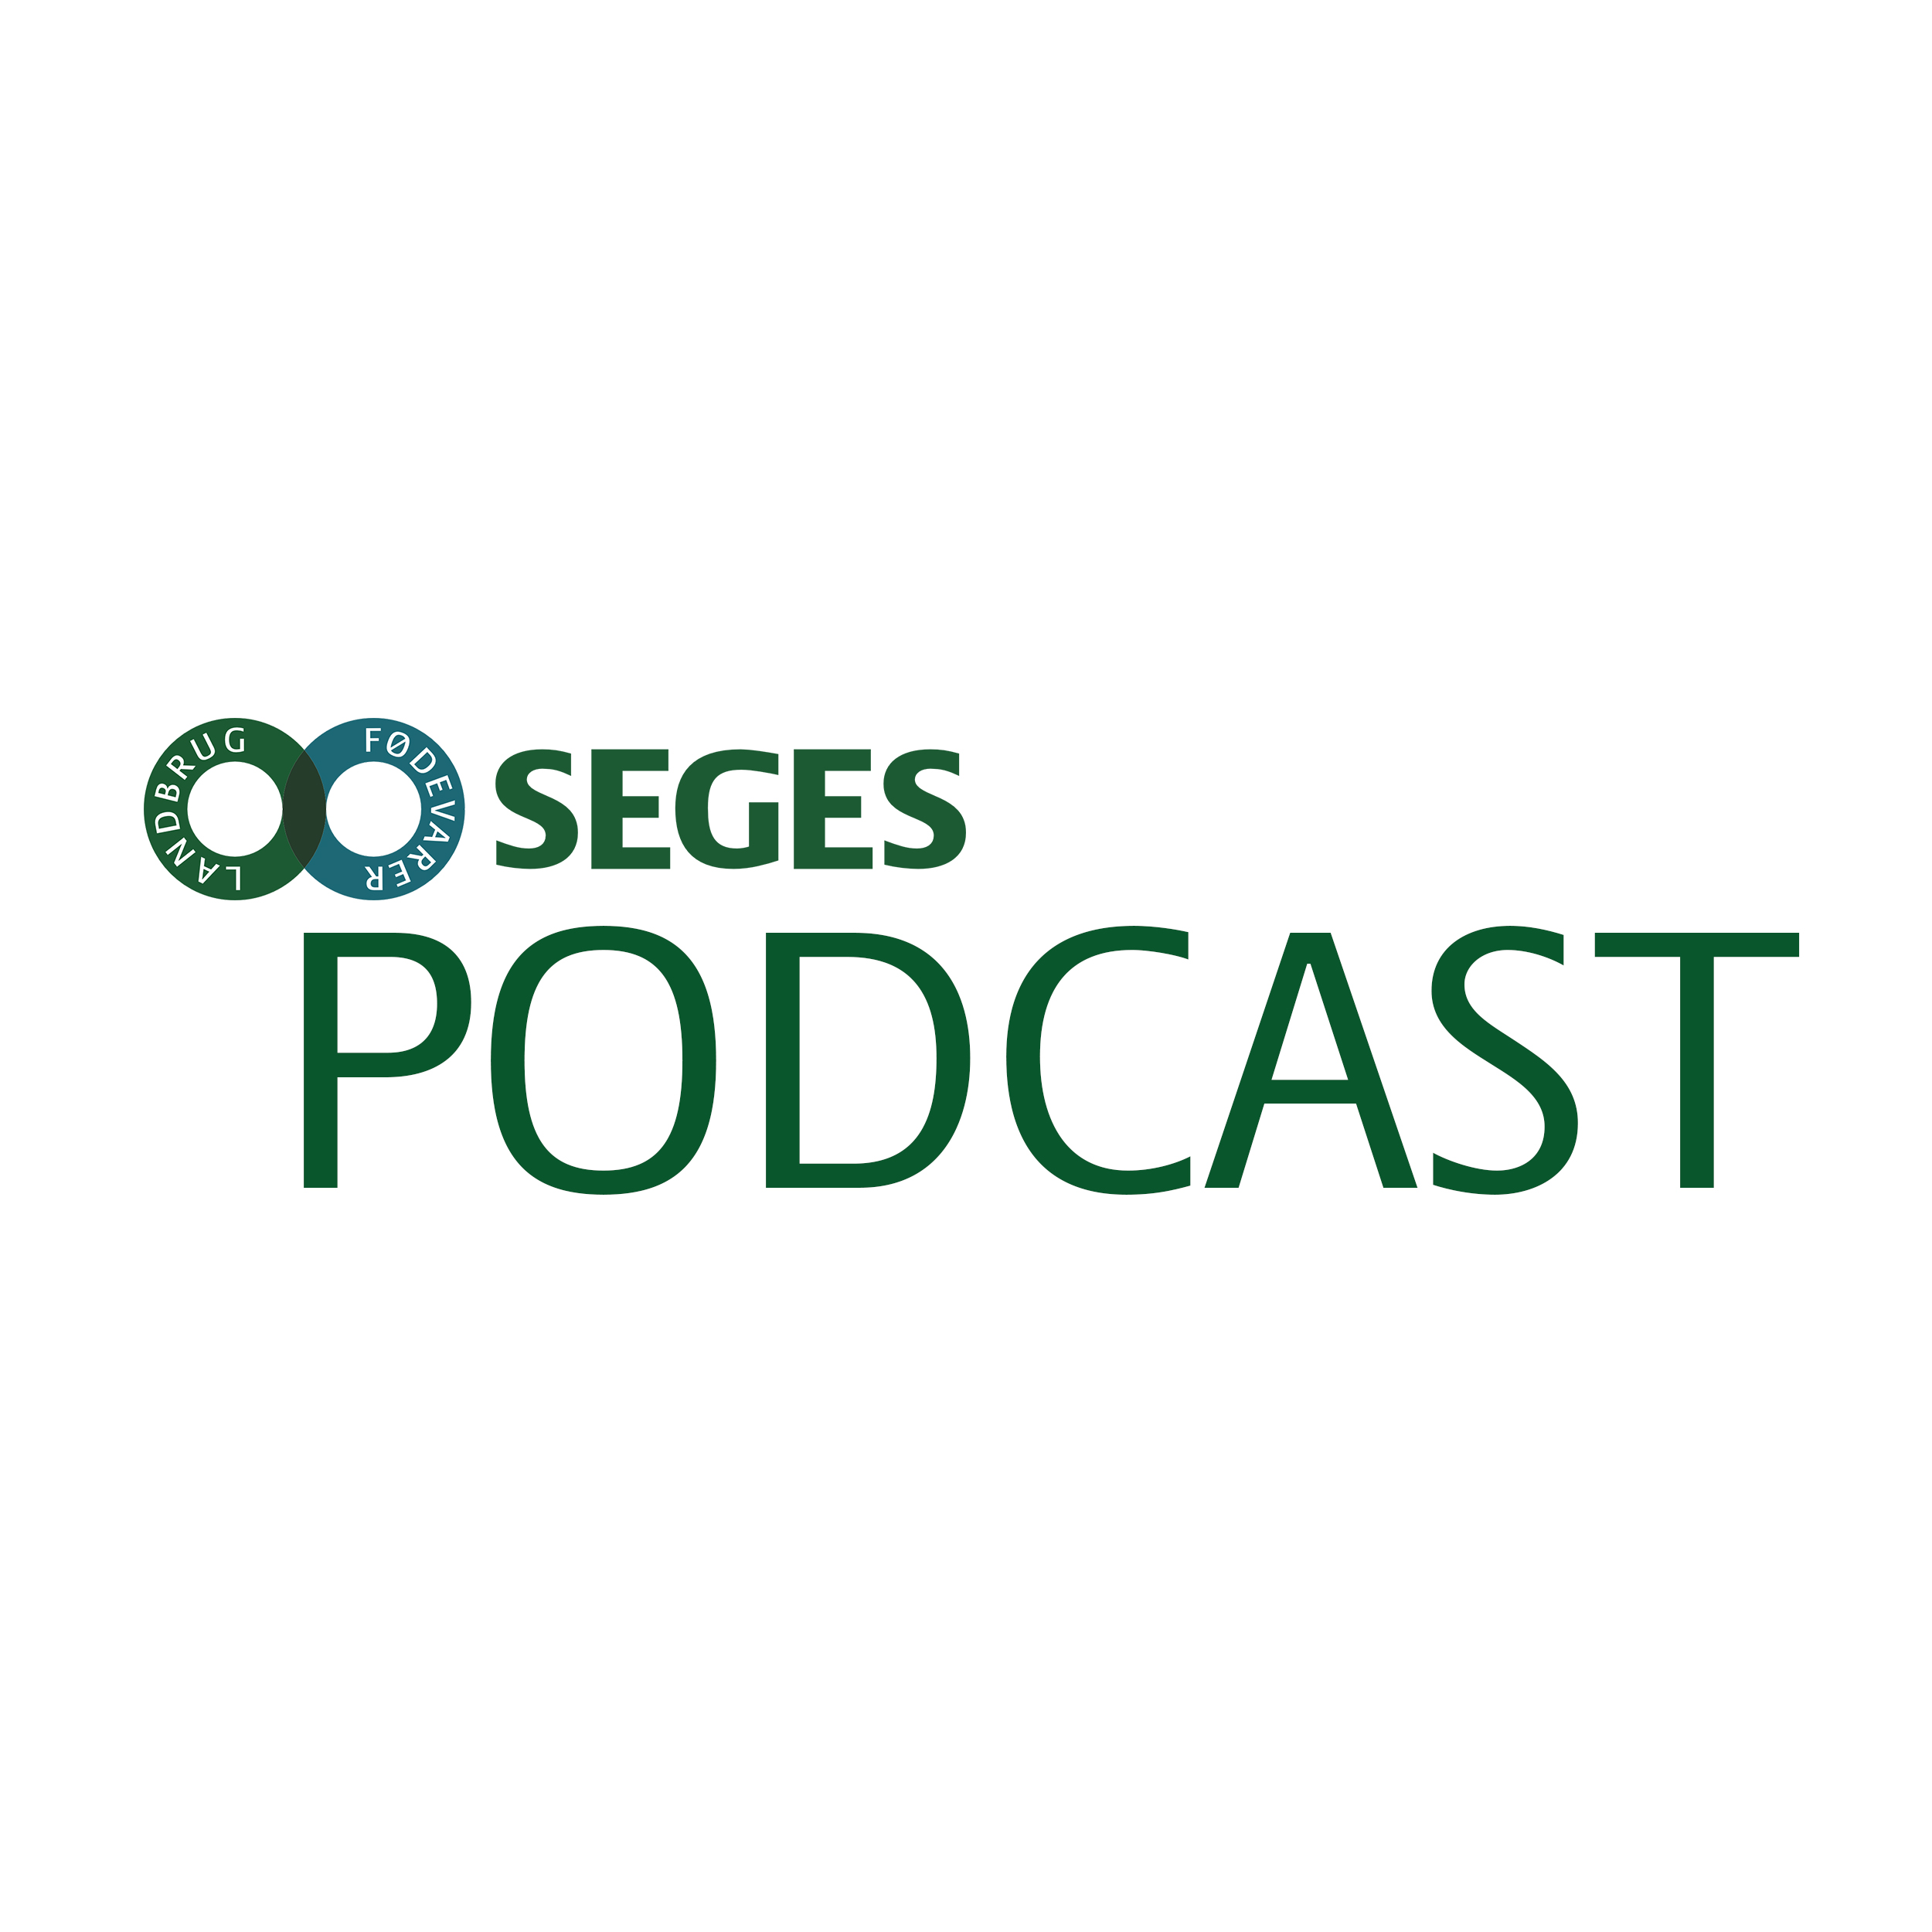 SEGES podcast